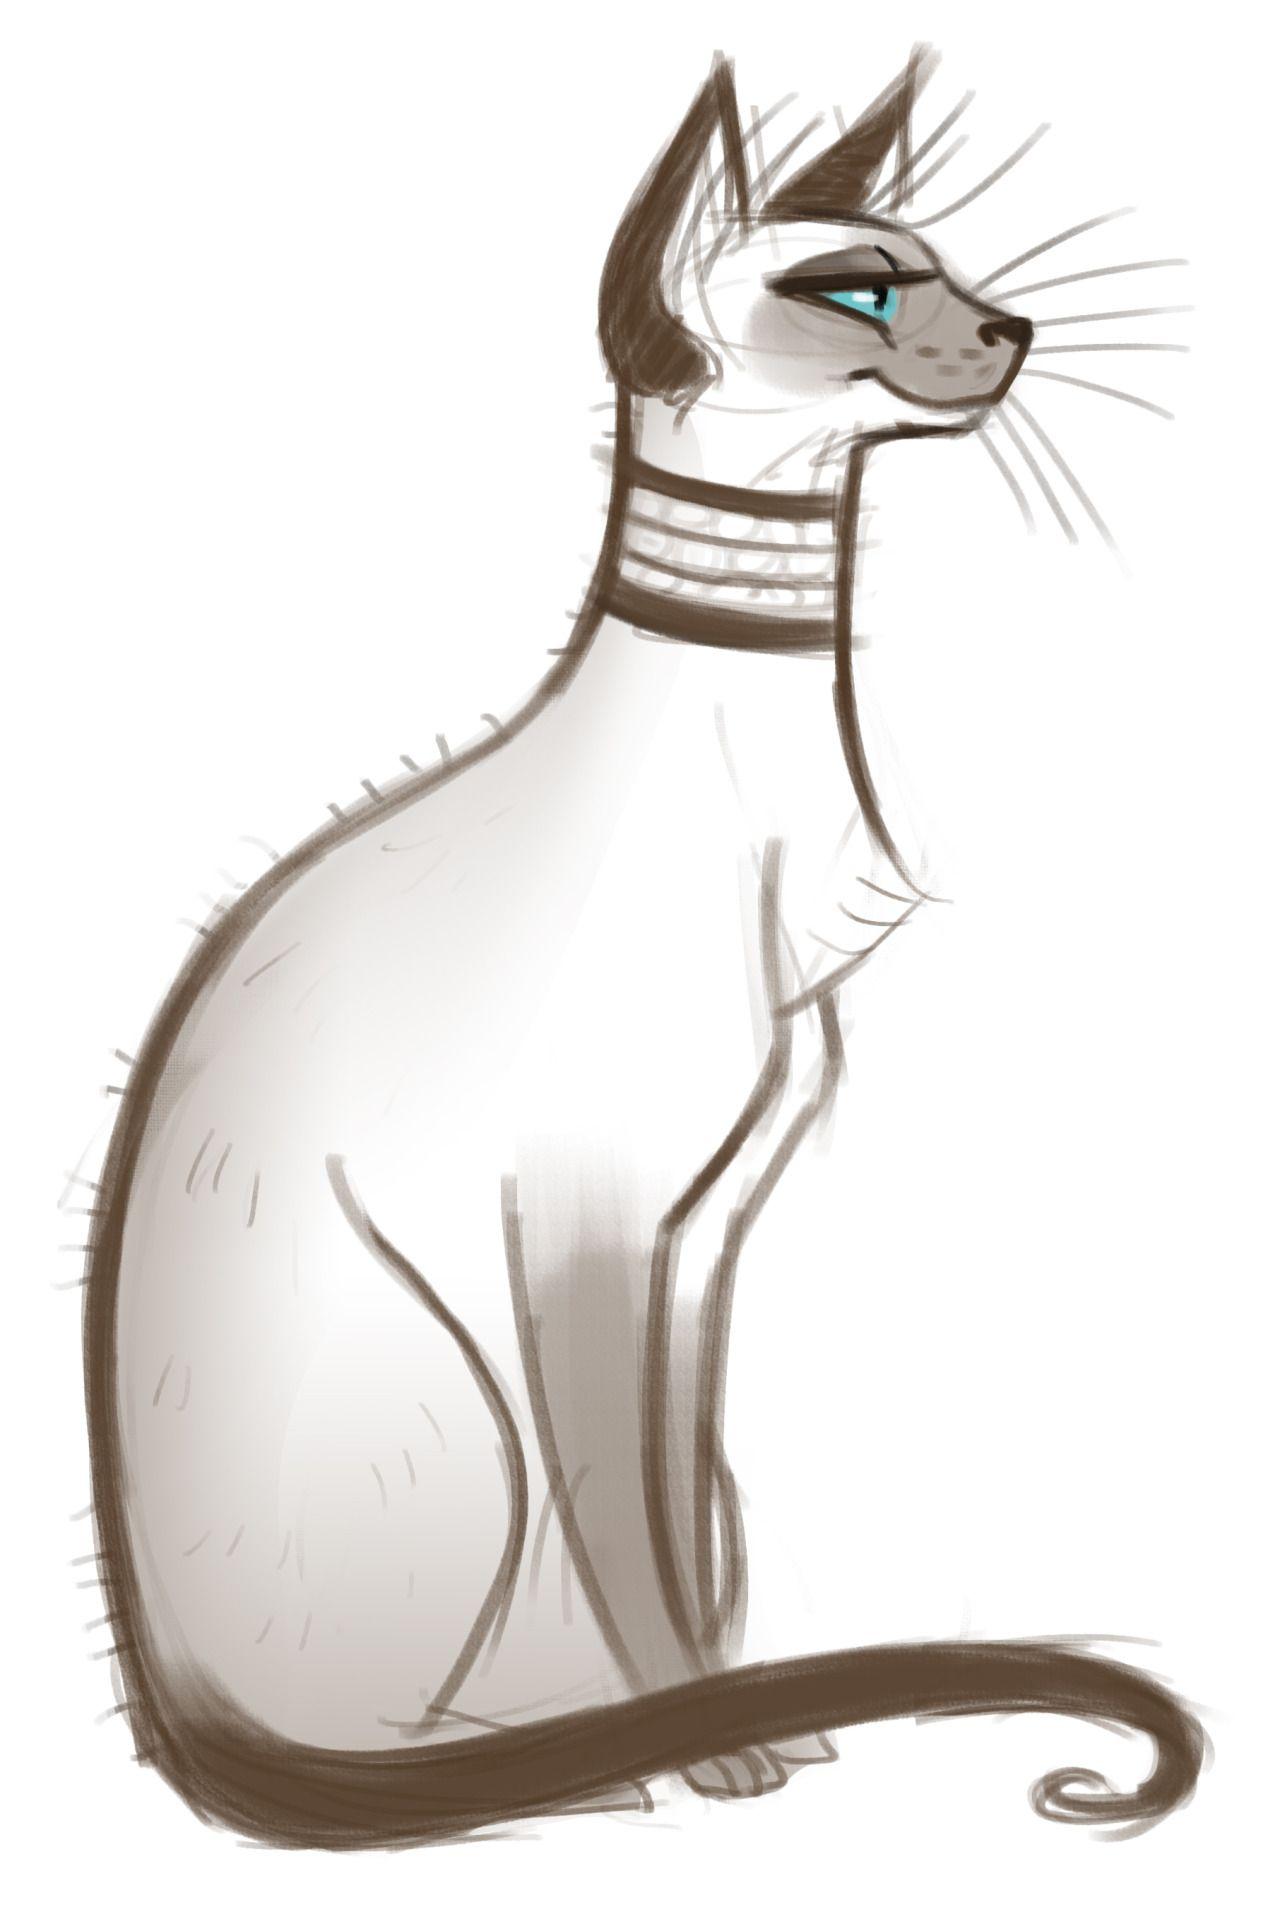 Картинка сиамской кошки для срисовки